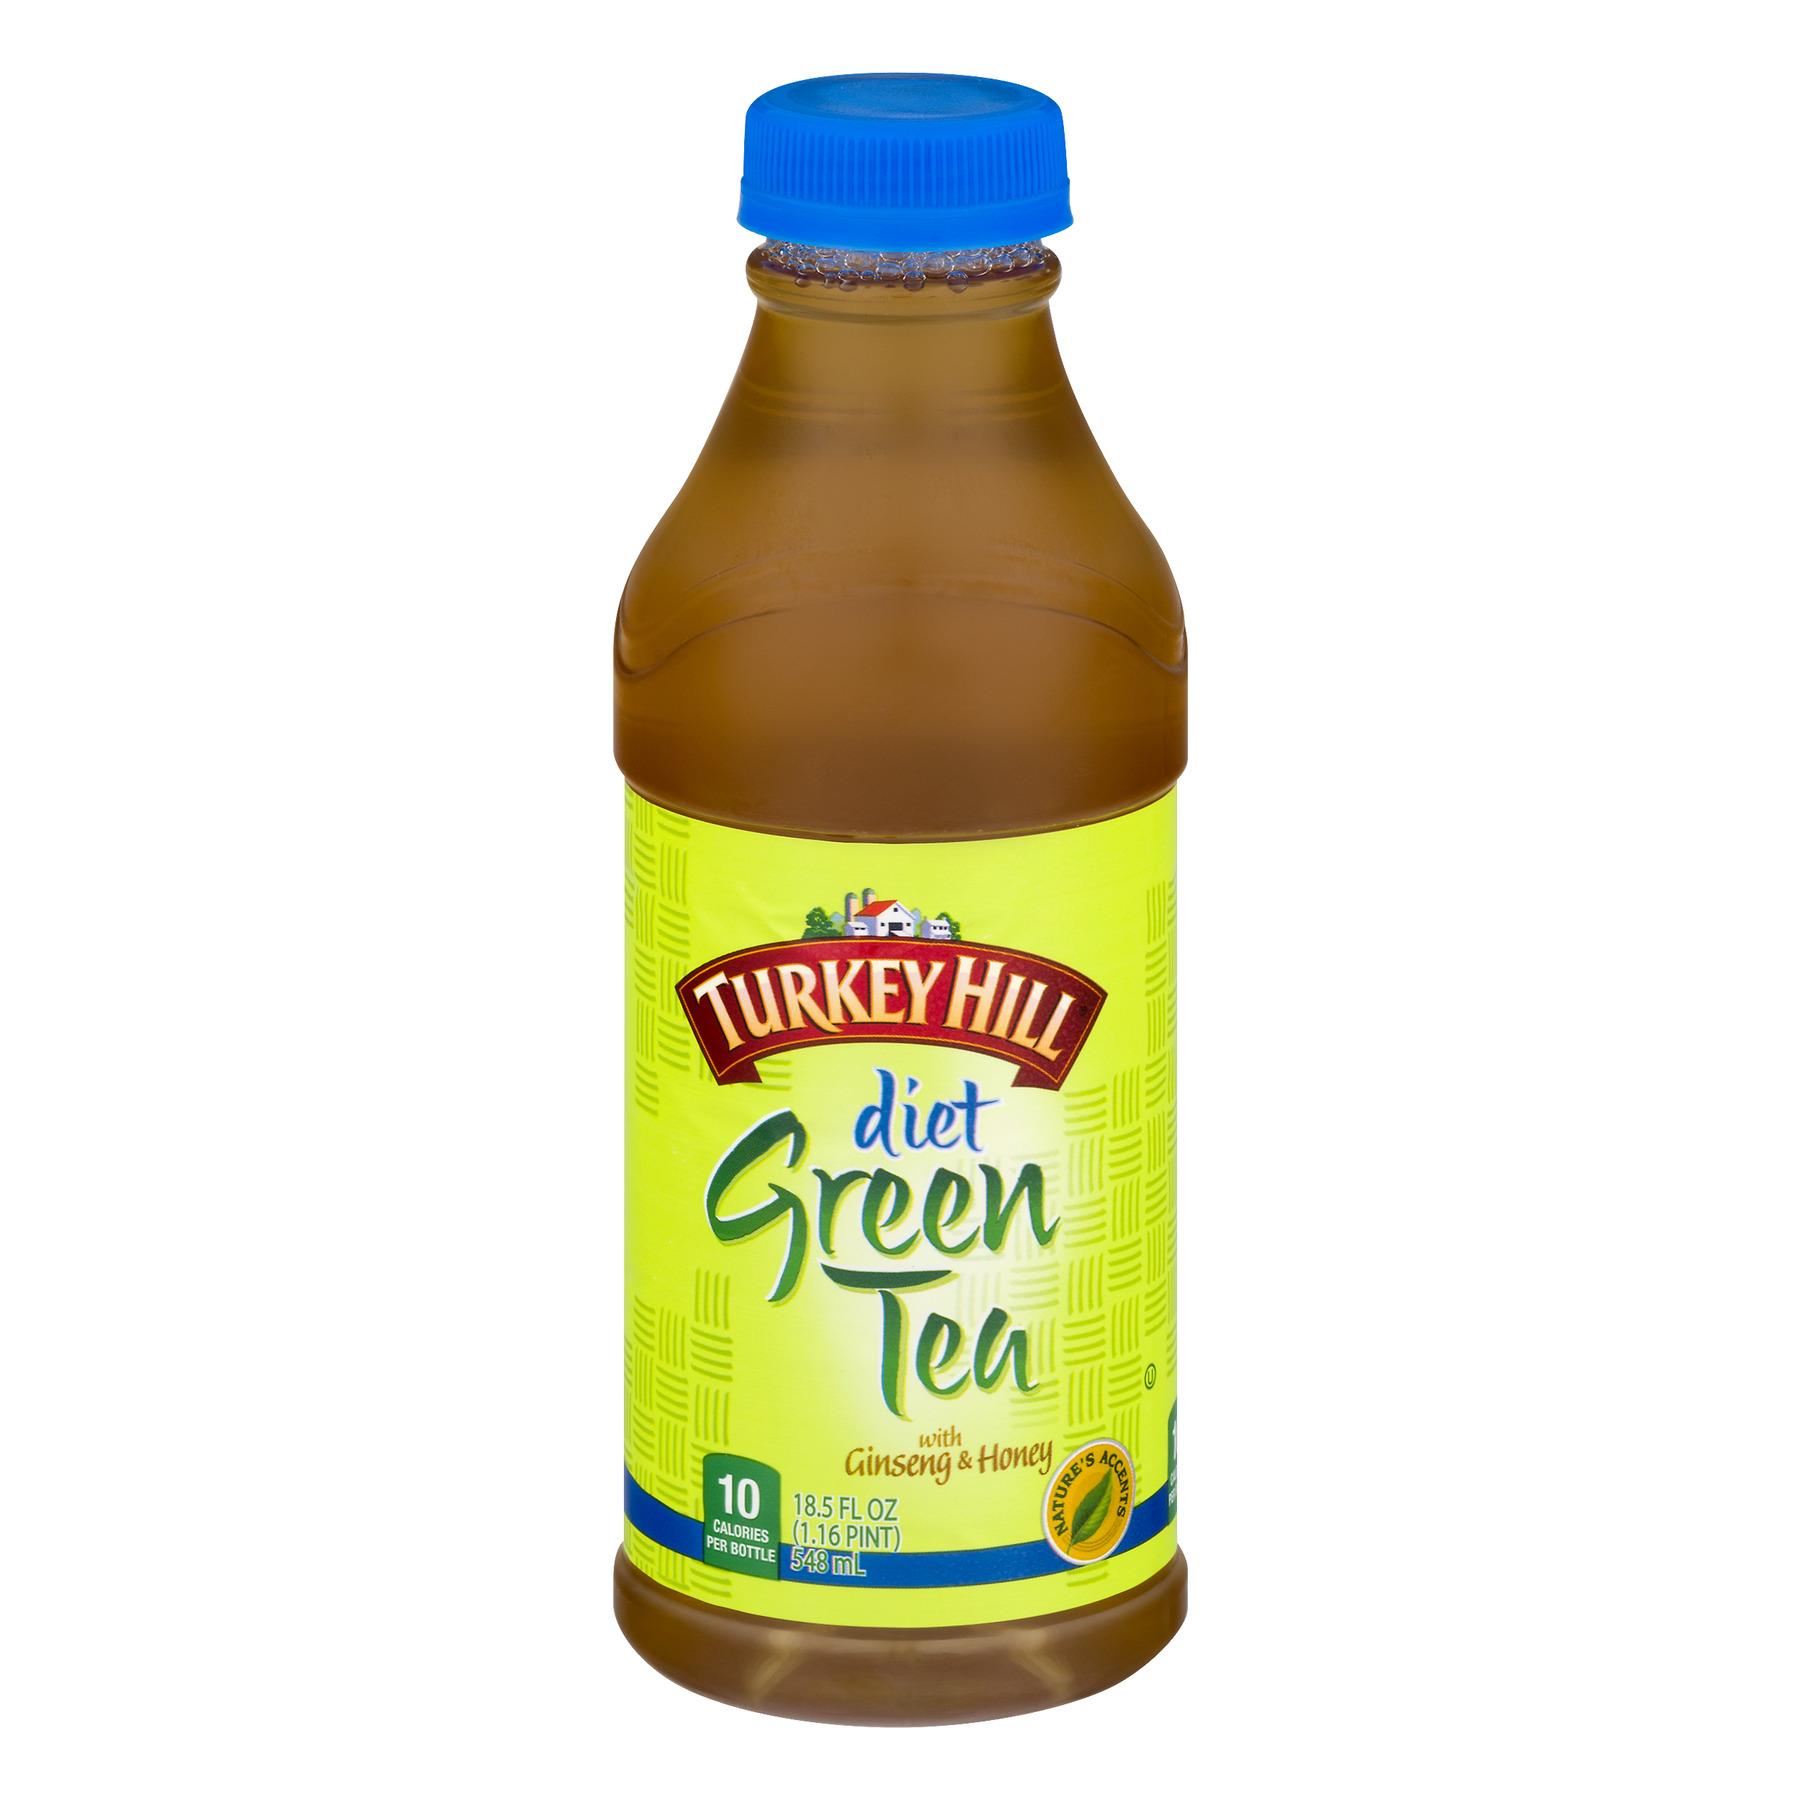 Turkey Hill Diet Green Tea with Ginseng & Honey, 18.5 Fl. Oz.